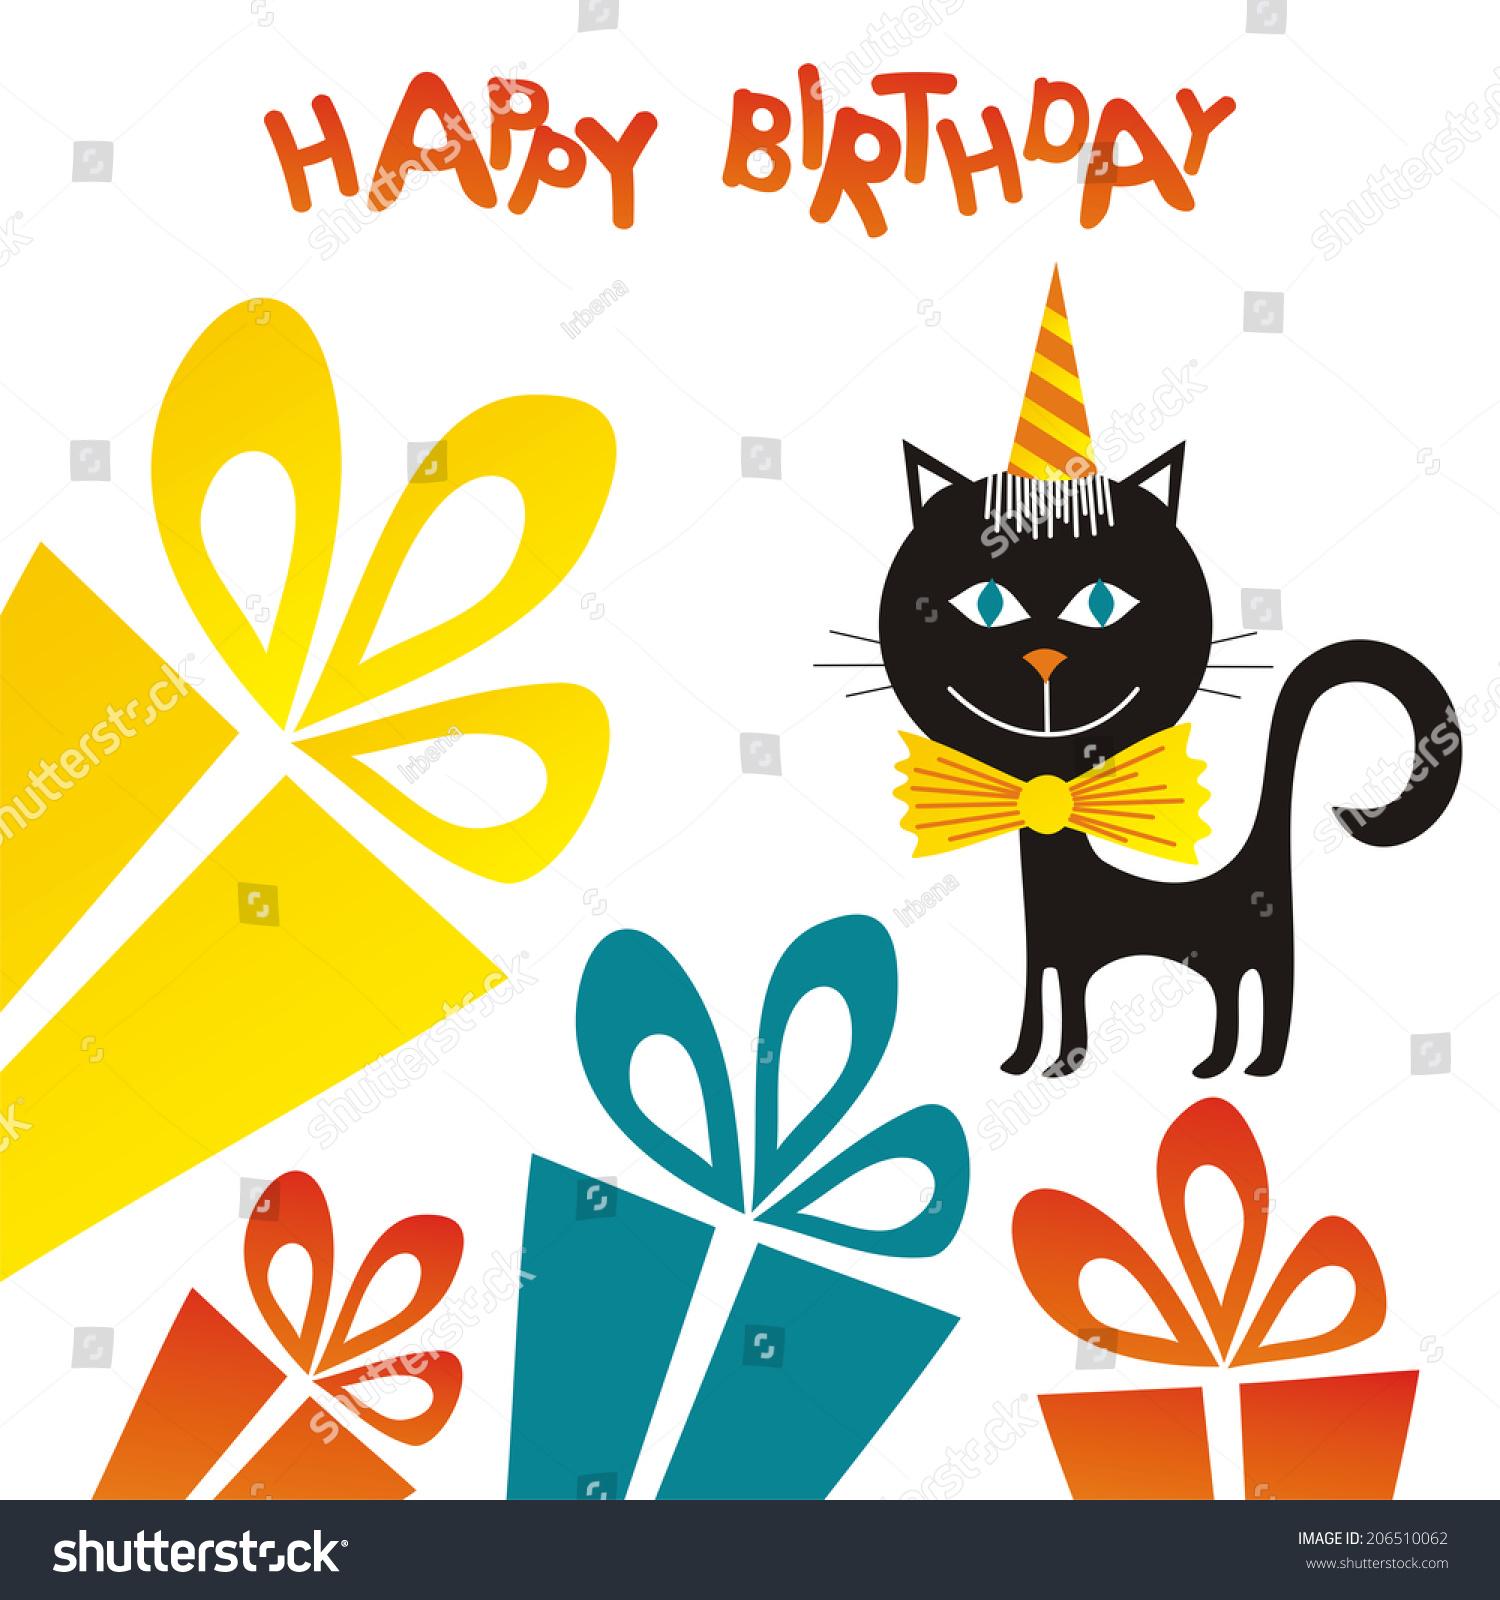 Happy Birthday Greeting Card Cat Gifts Stock Illustration 206510062